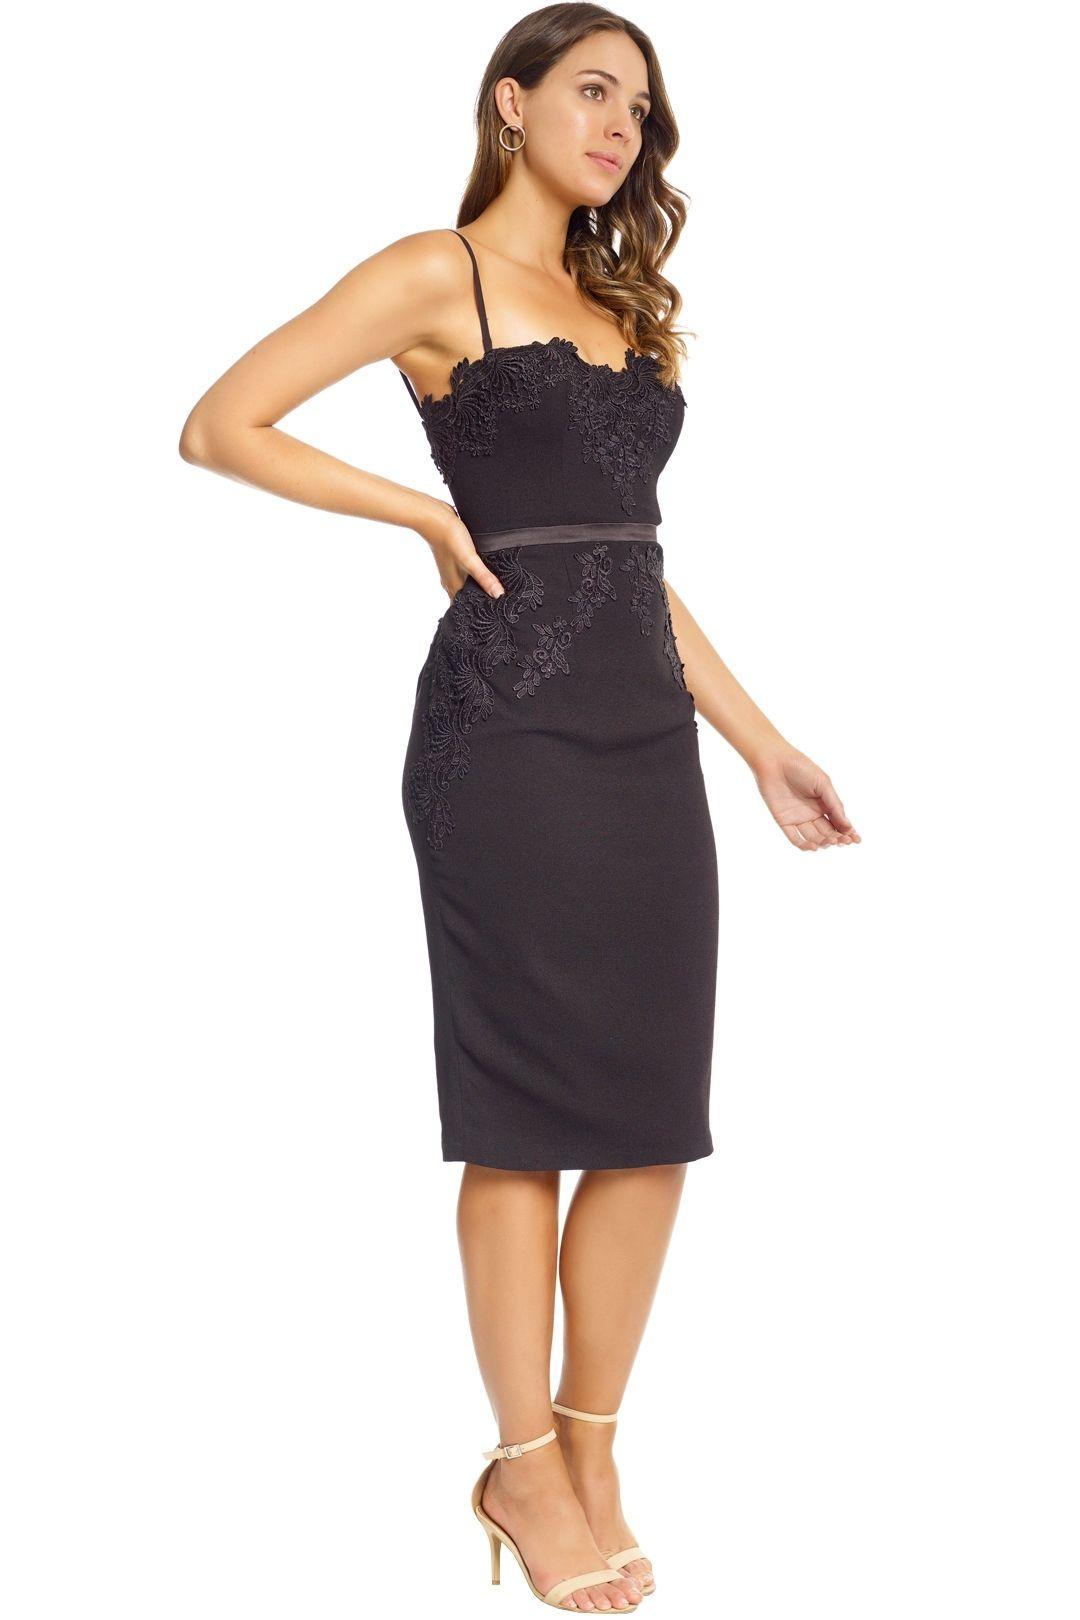 Elle Zeitoune - Black Madeline Dress - Black - Side